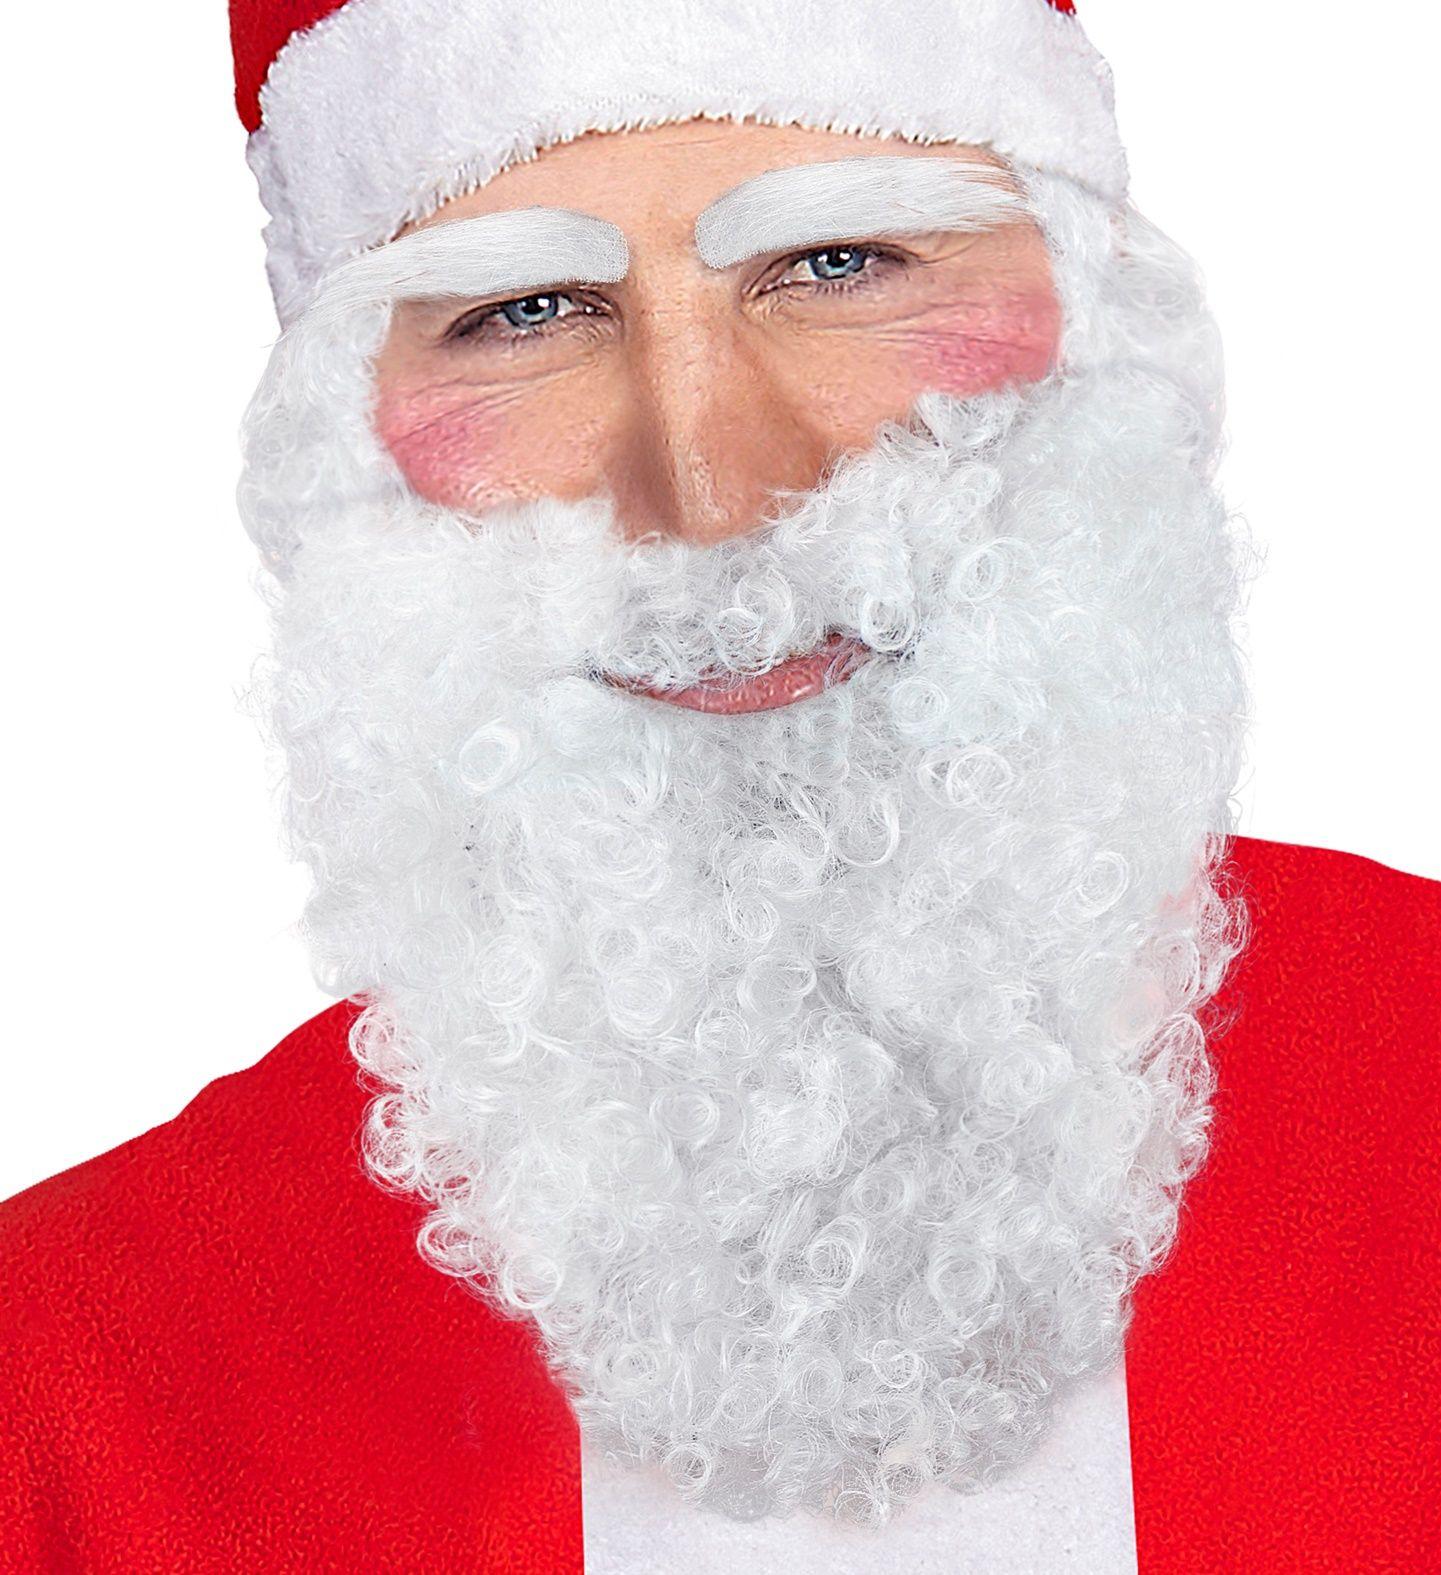 Kerstman baard, snor en wenkbrauwen wit